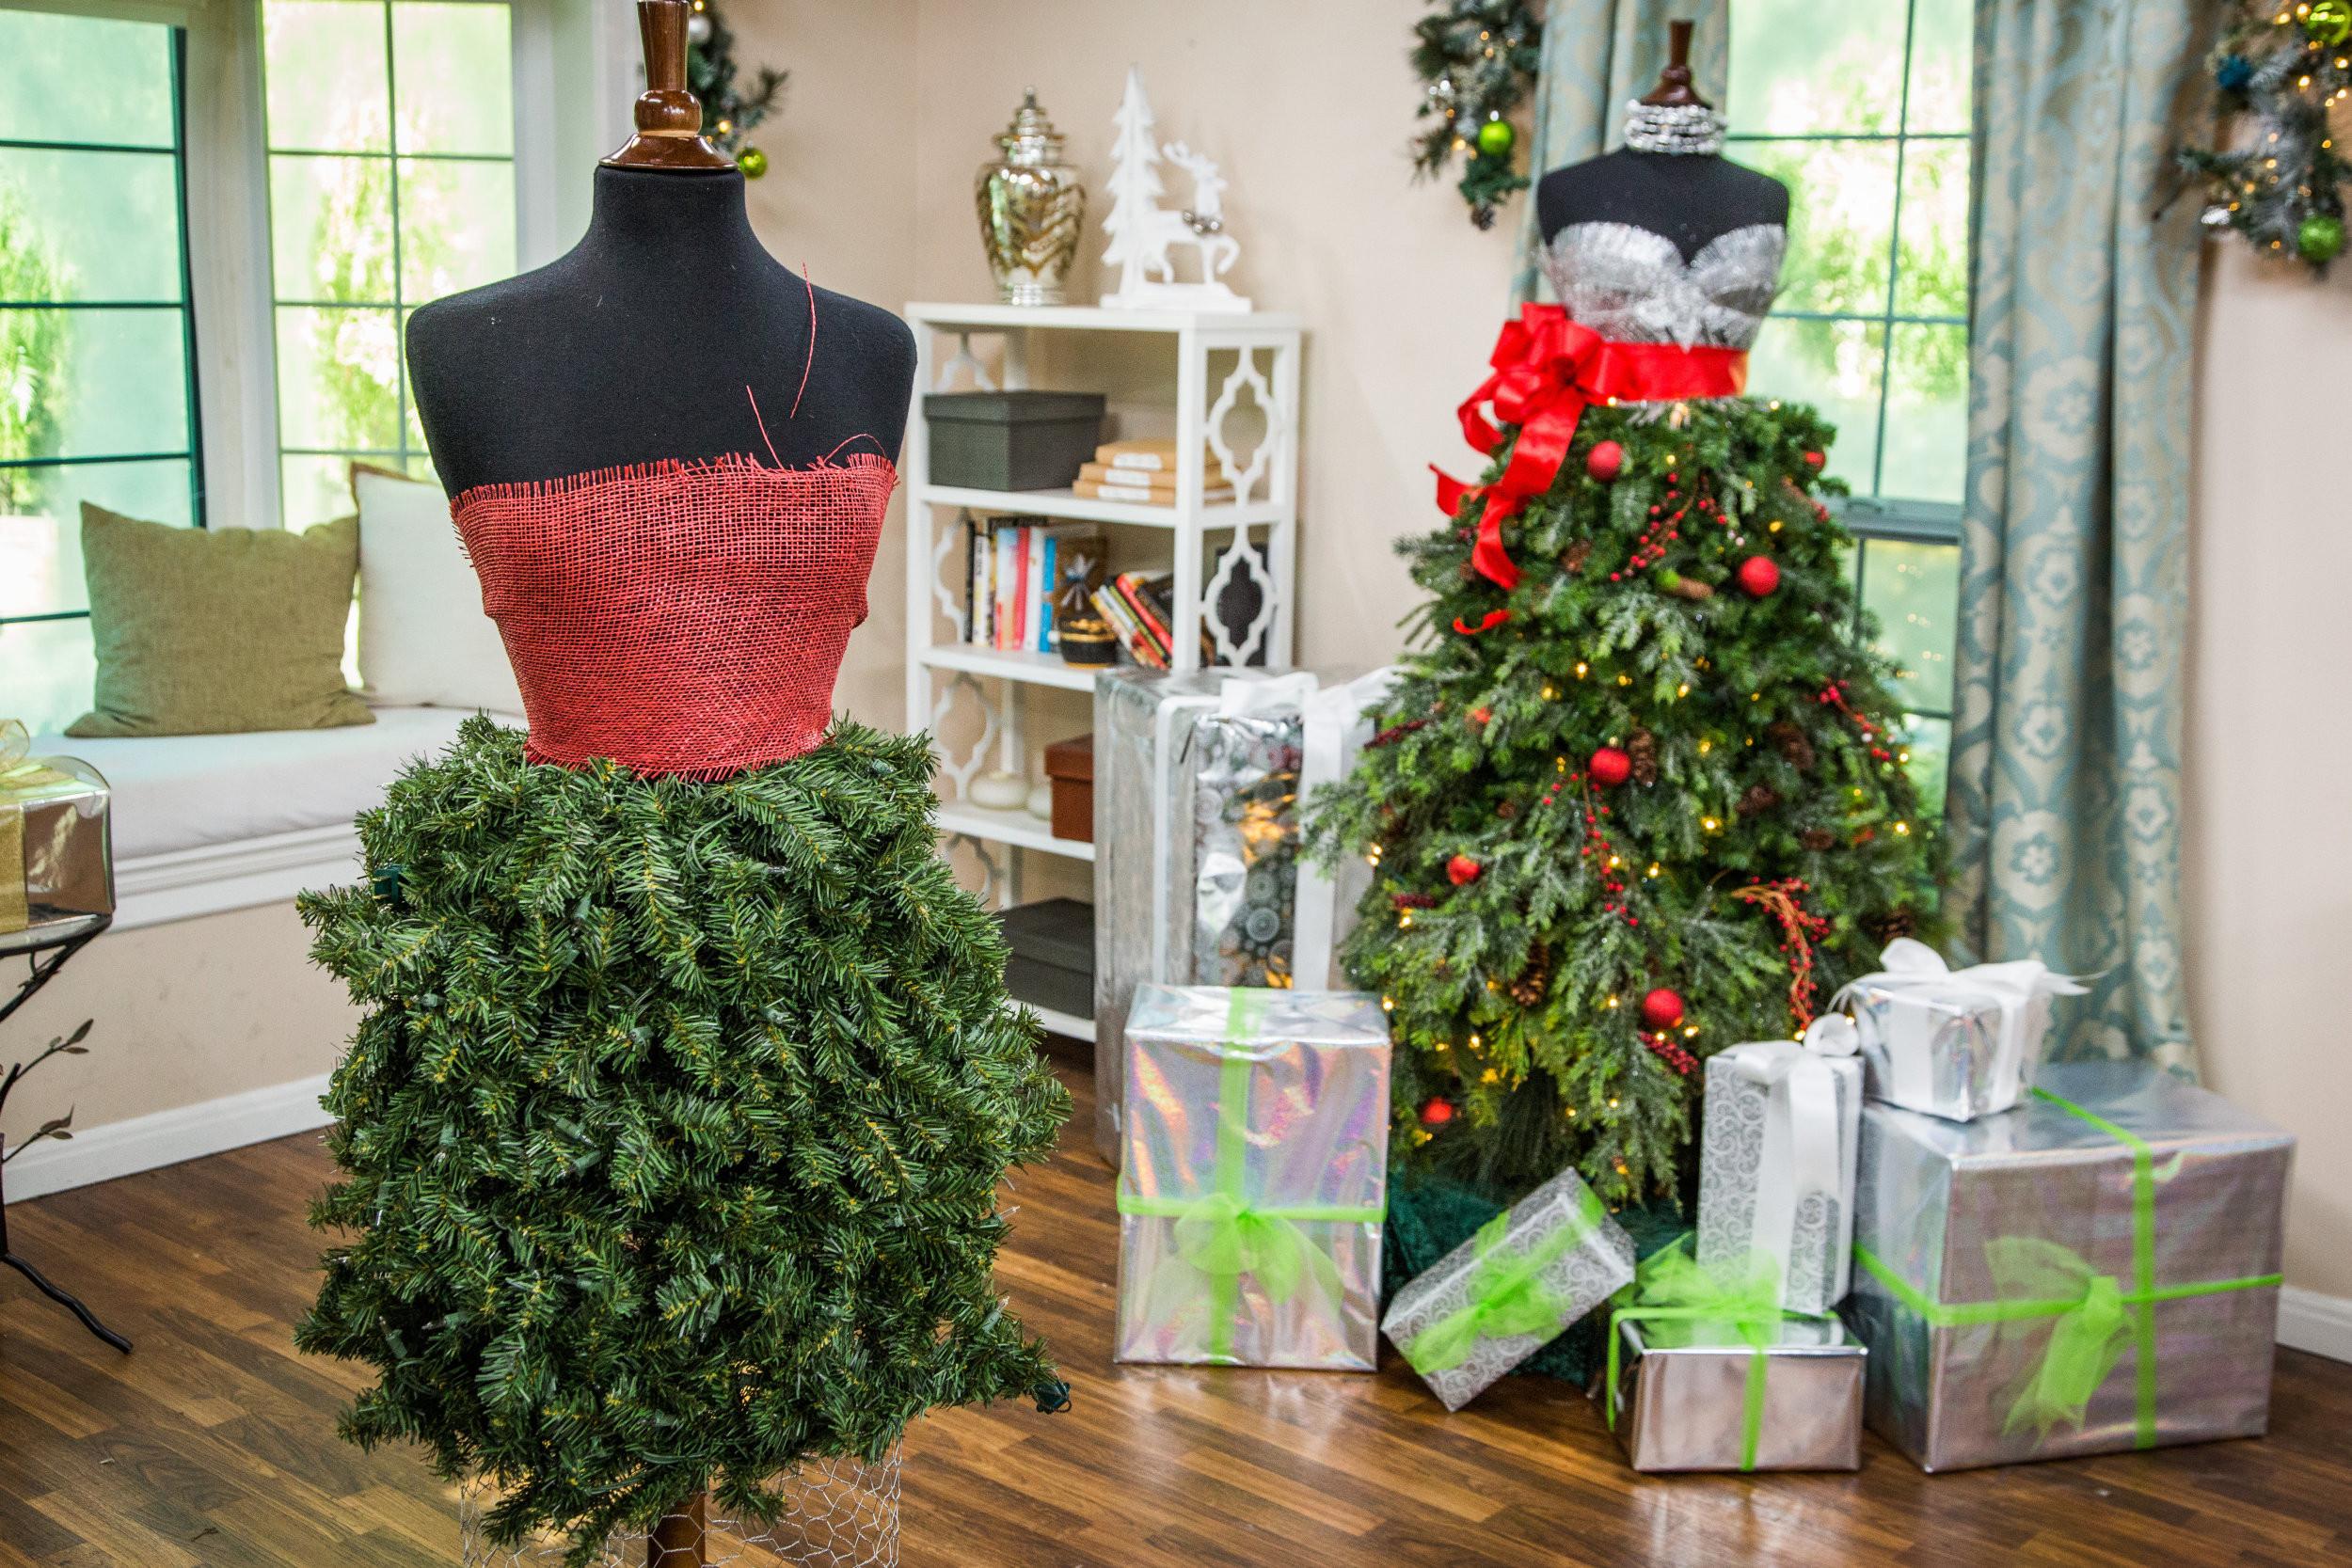 DIY Christmas Decorations  How To DIY Christmas Ornament Dress